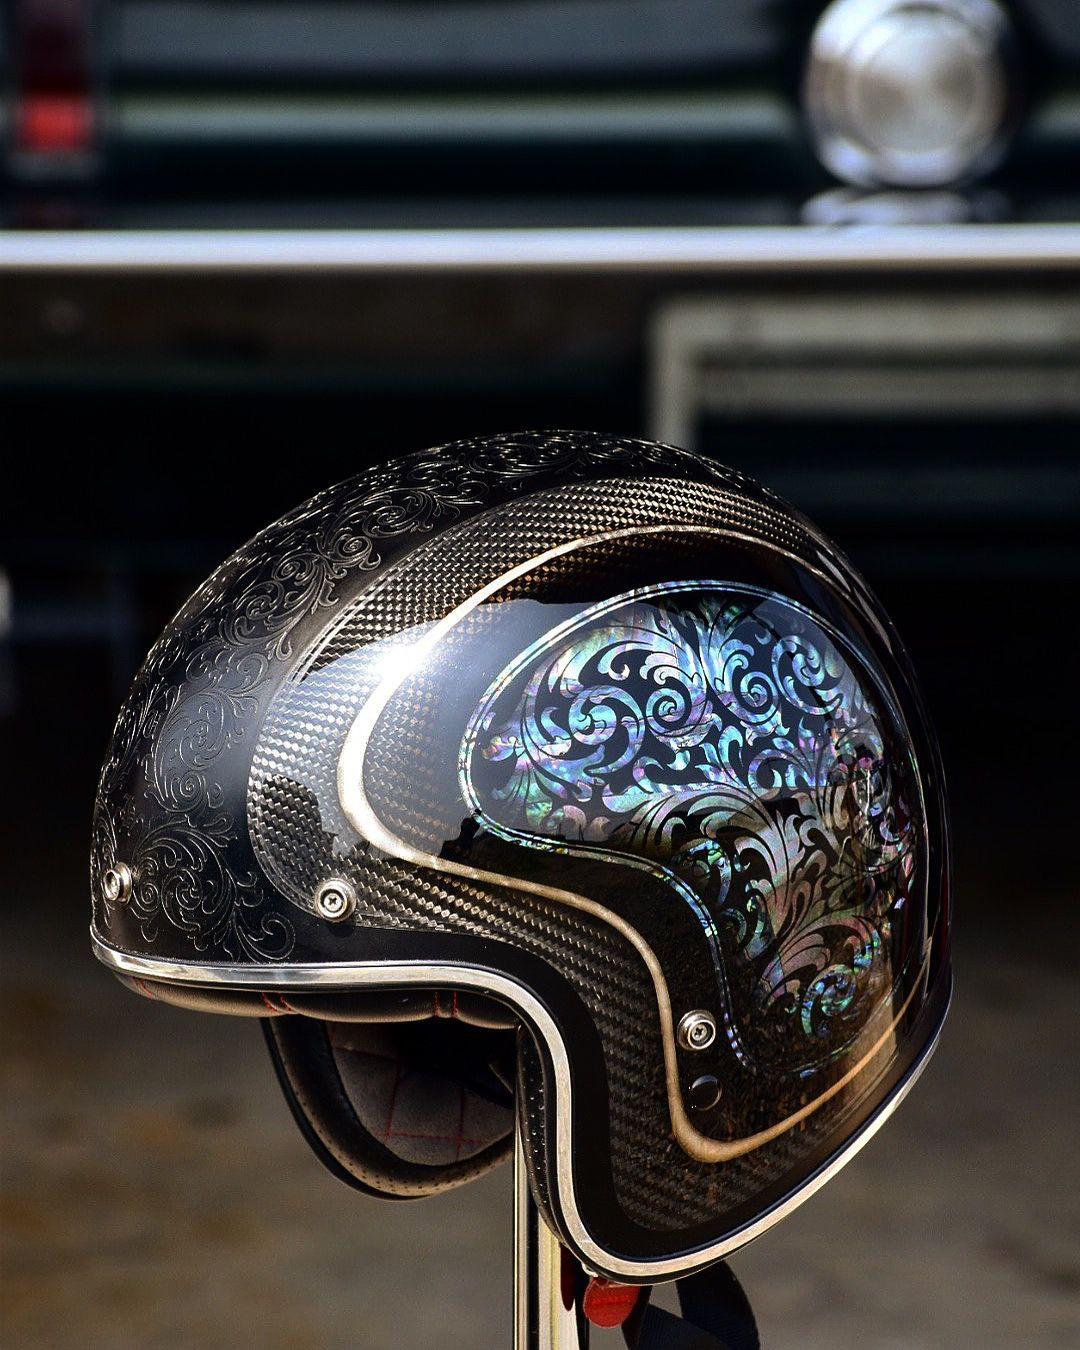 Completion Avalonshell 3dpaint Kingscustompaint Kings キングスカスタムペイント Bellhelmets Harleydavidson Custompaint Kingsoriginal カスタムヘルメット